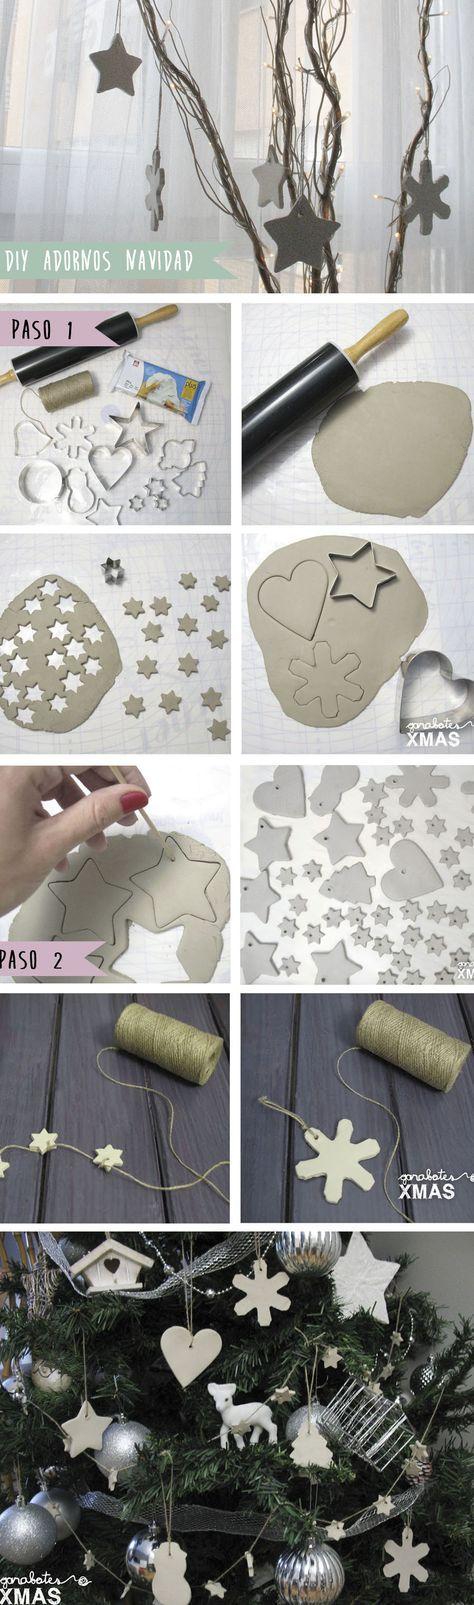 DIY Adornos con pasta de modelar. Christmas handmade clay ornaments